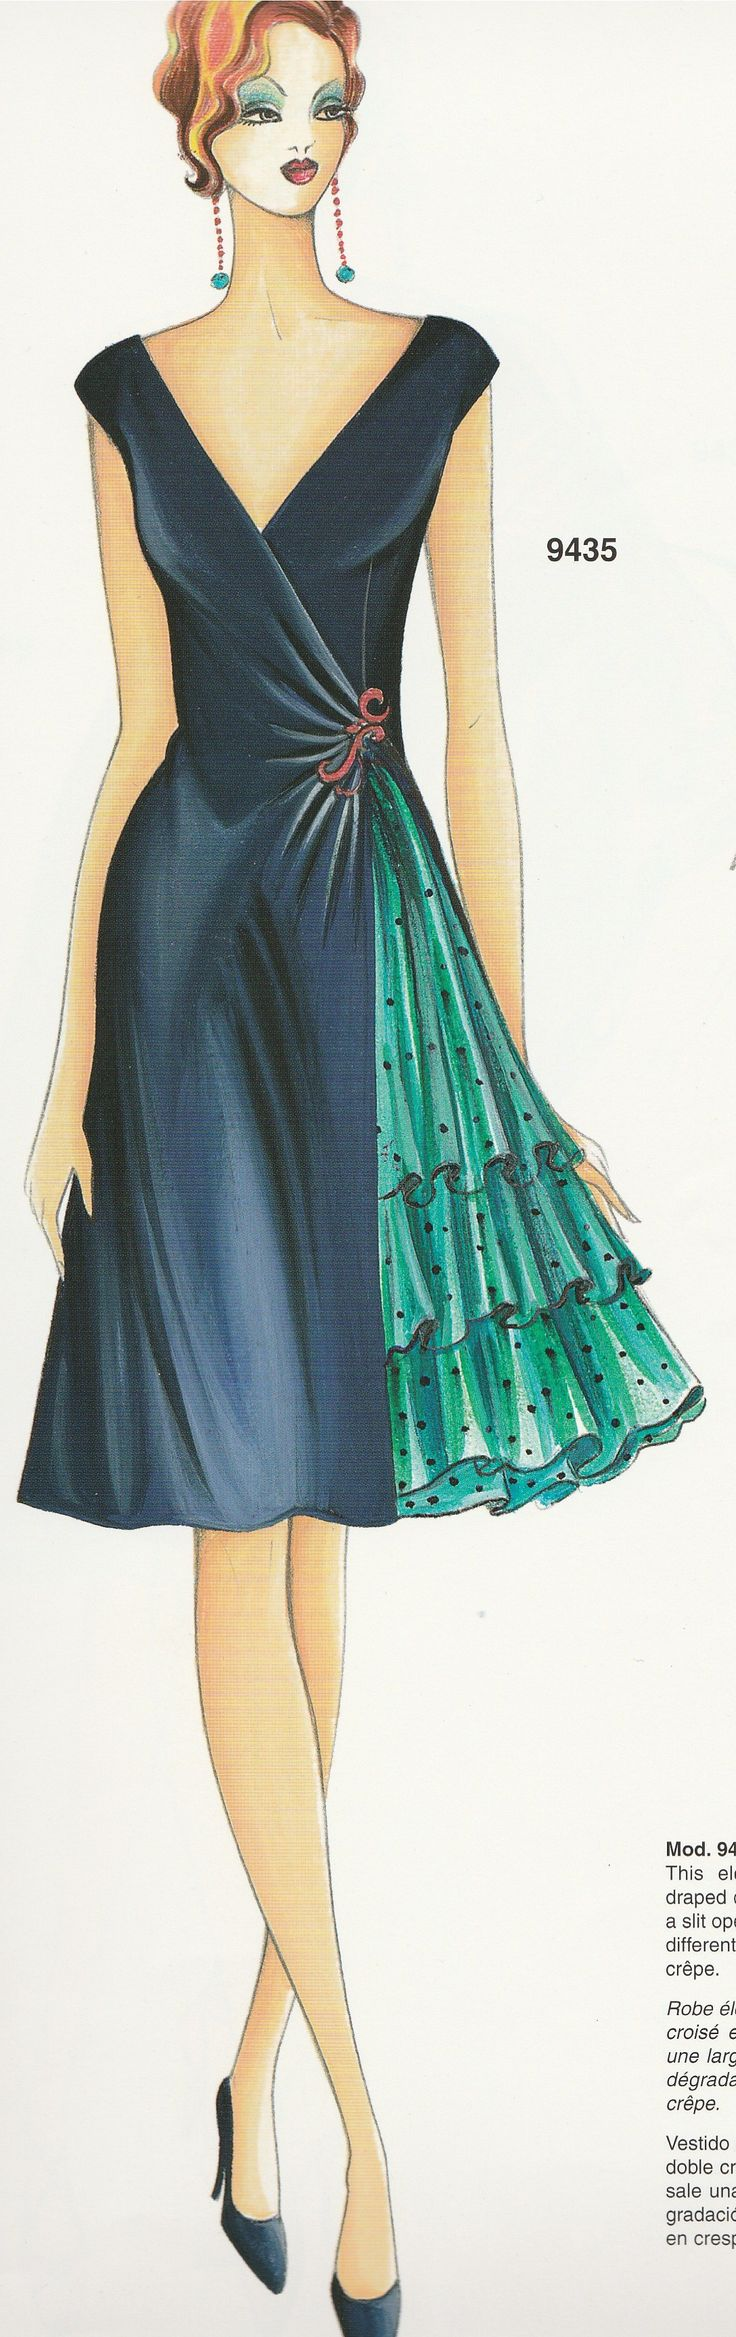 528 best Fashion Illustration images on Pinterest | Fashion drawings ...